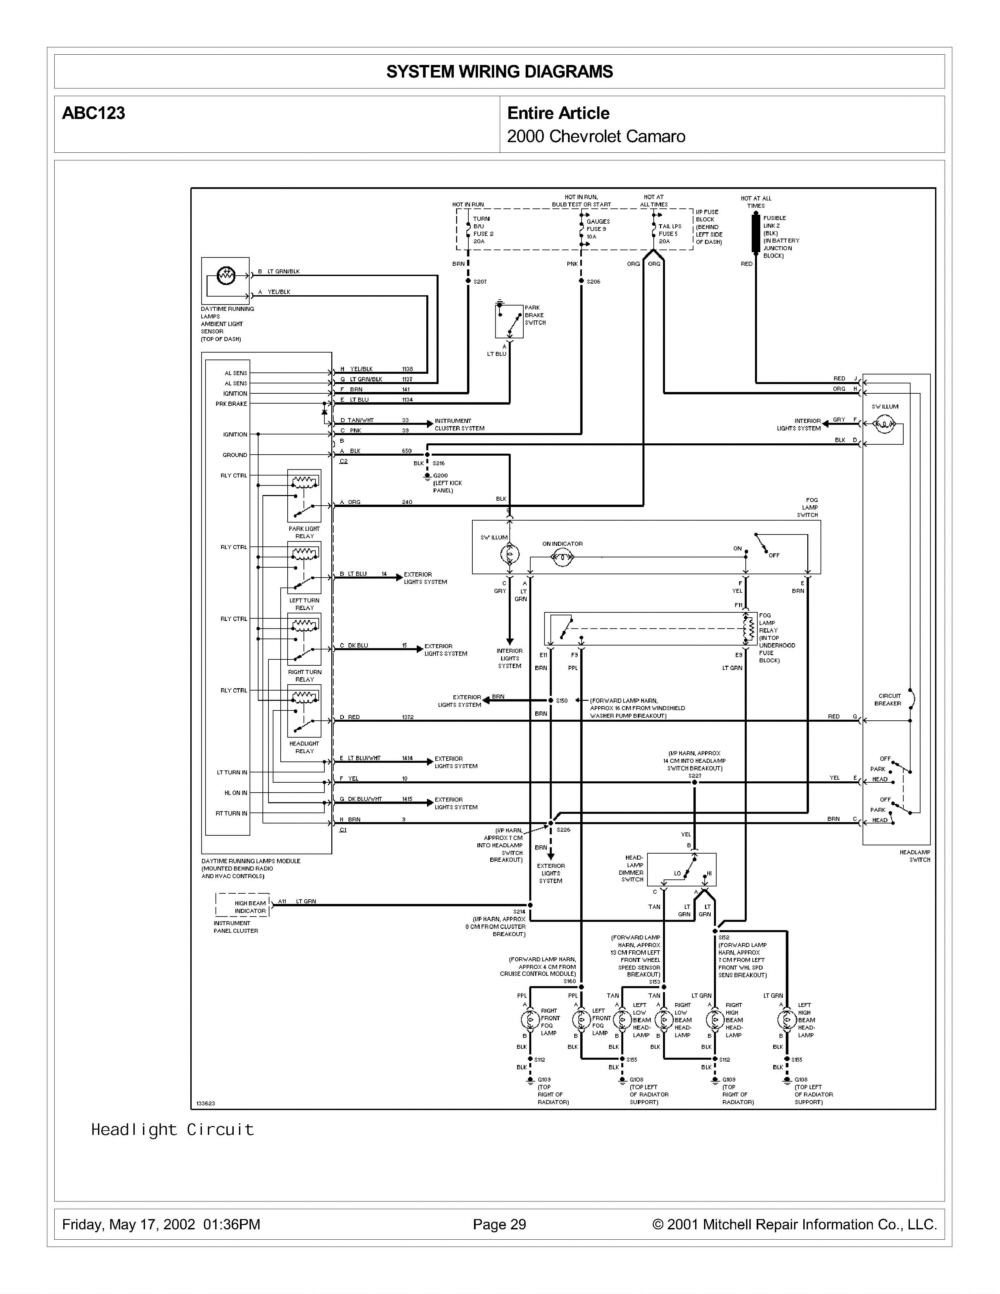 2000 chevy camaro headlight wiring diagram wiring library First Camaro Z28 2000 chevy camaro headlight wiring diagram